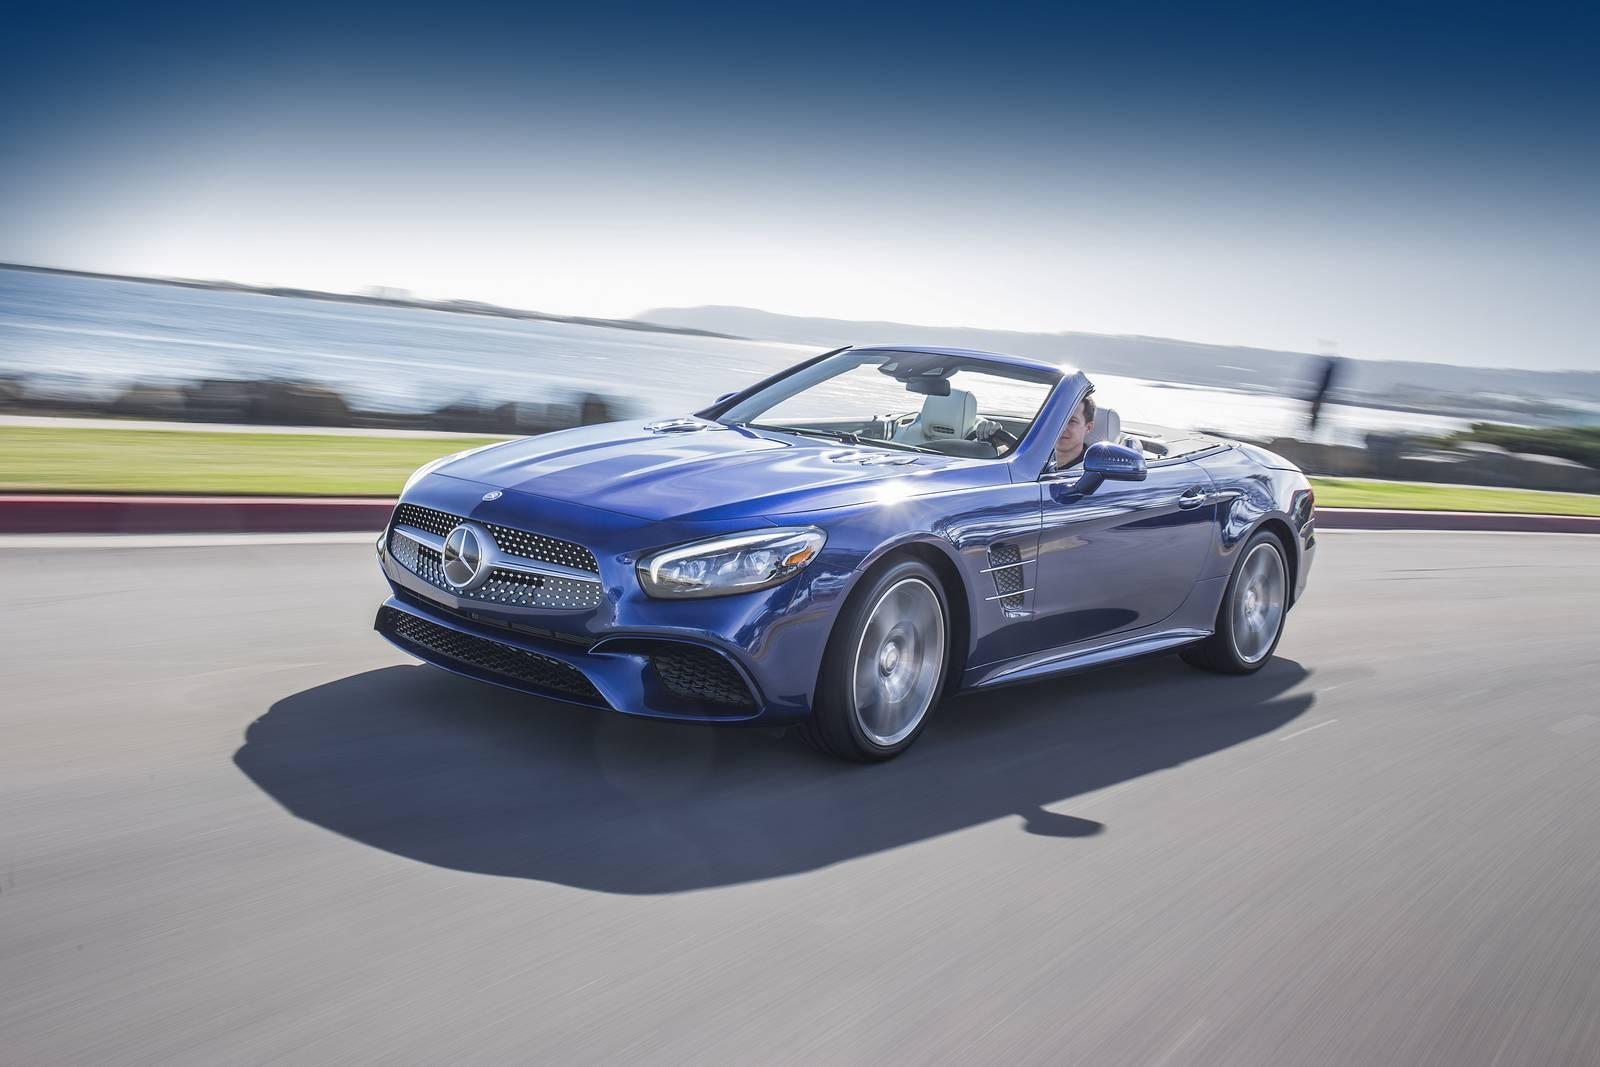 2017 mercedes benz sl review gtspirit for Blue mercedes benz